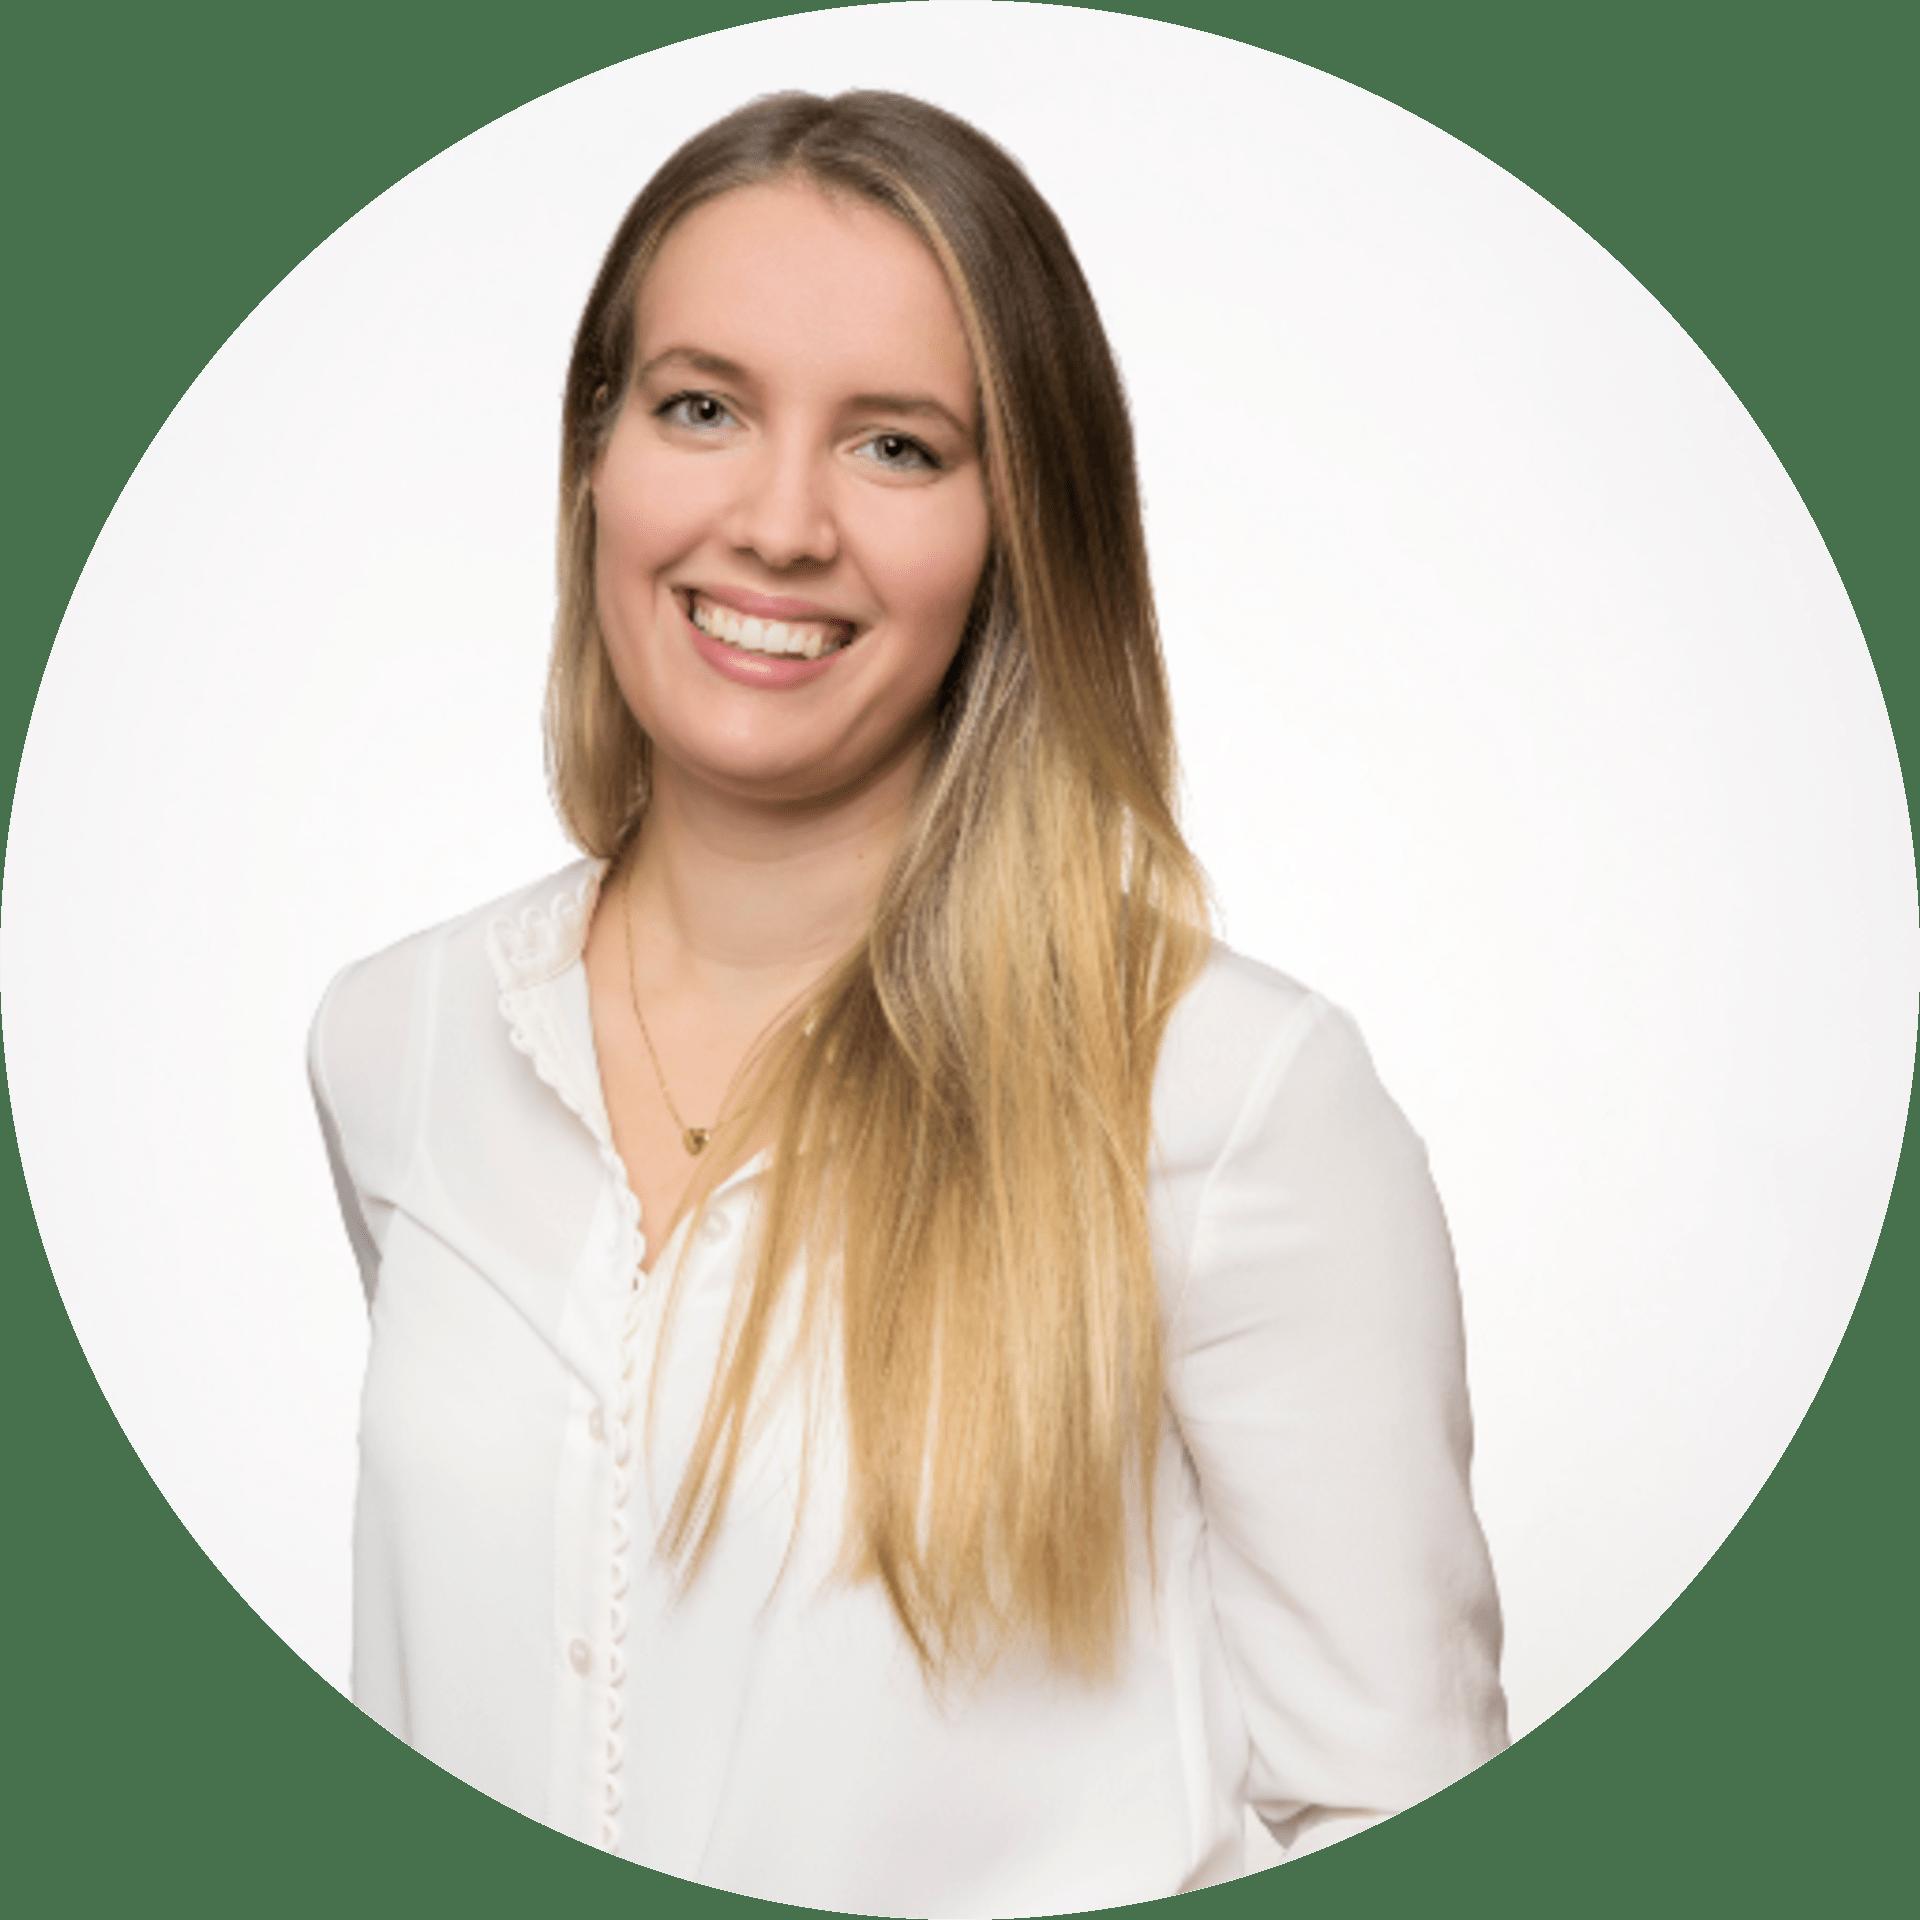 company contact Fabienne Rieckmann